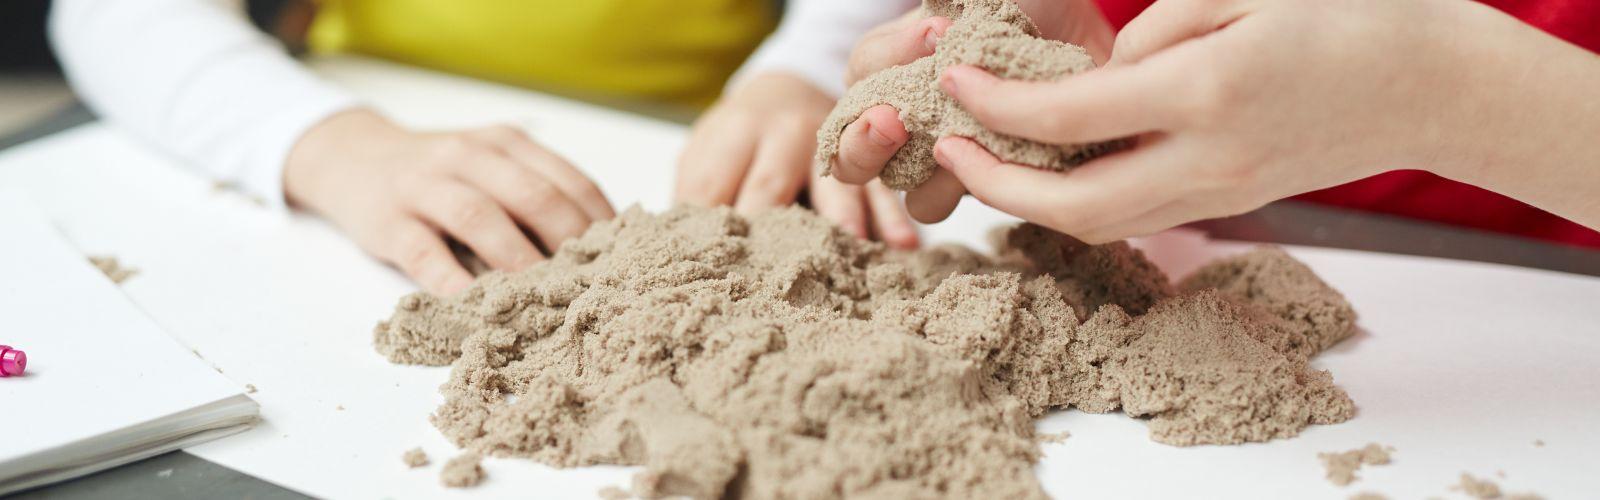 natural kinetic sand craft